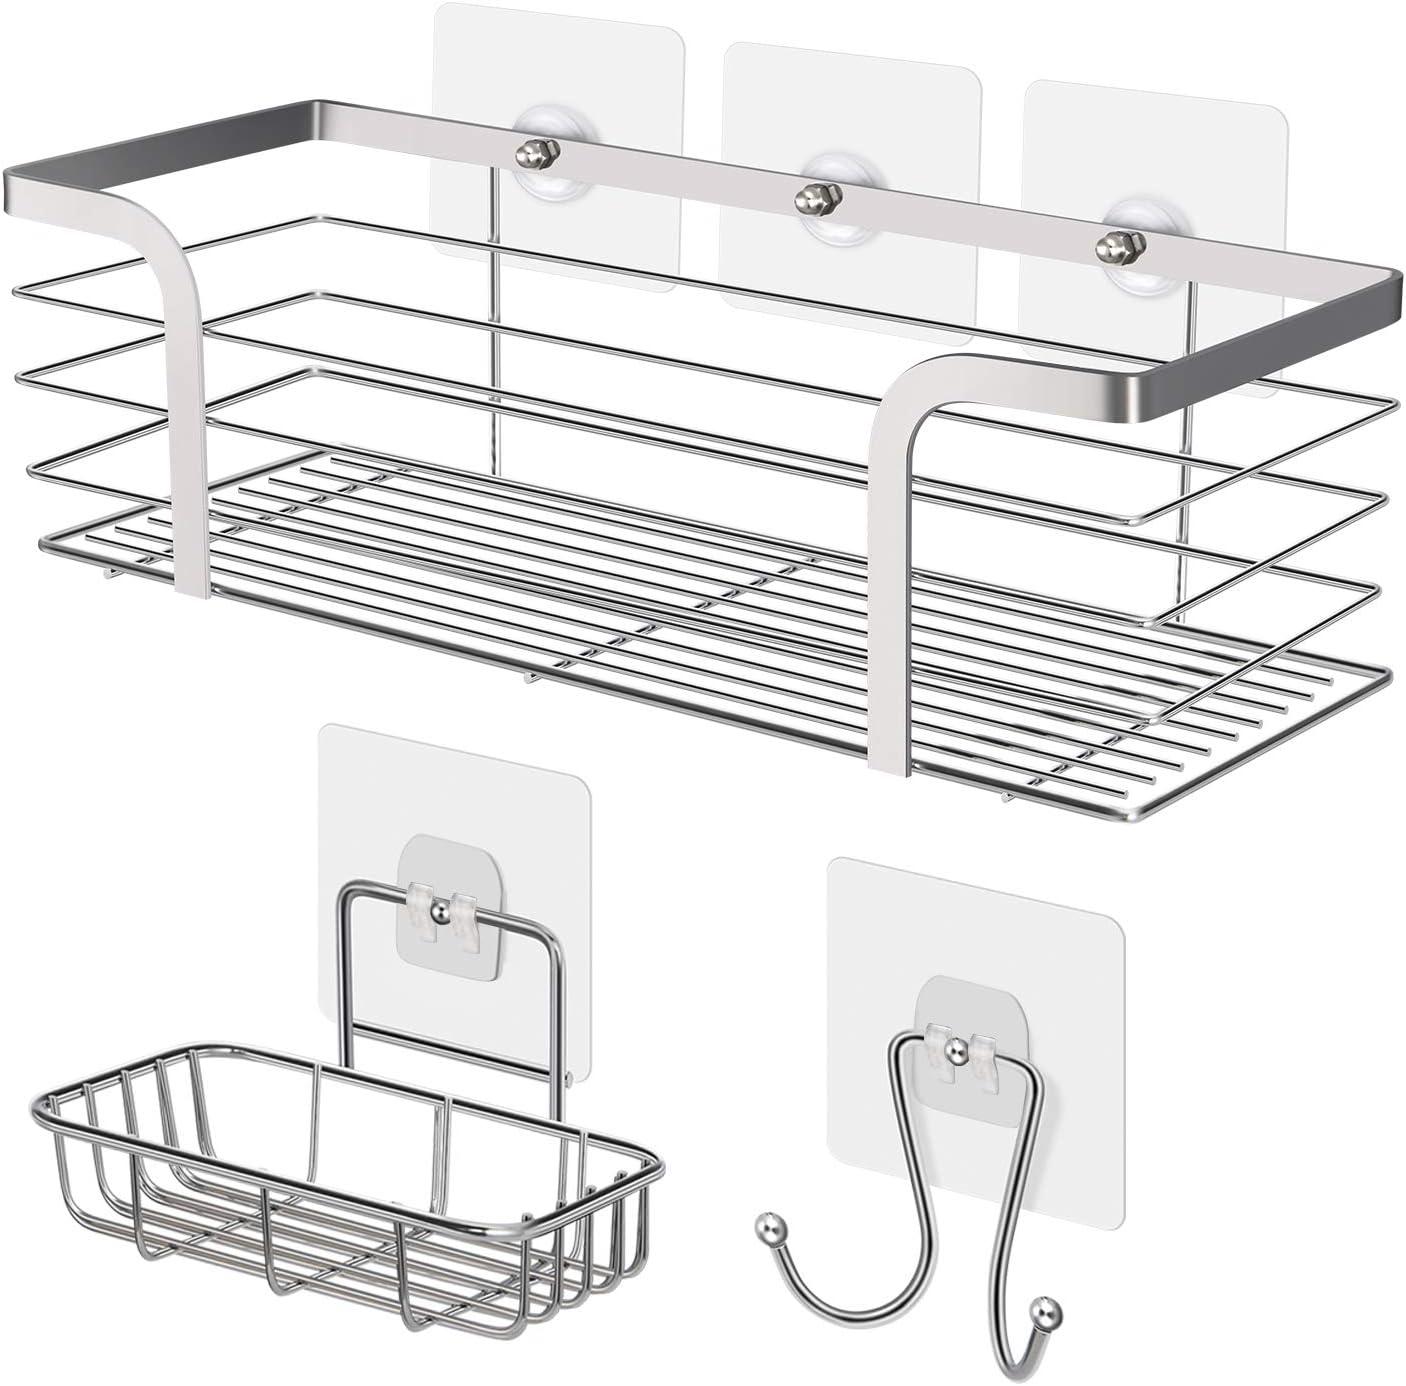 No Screw Modern 304 Stainless Steel Shower Baskets Chrome Bathroom Storage Racks